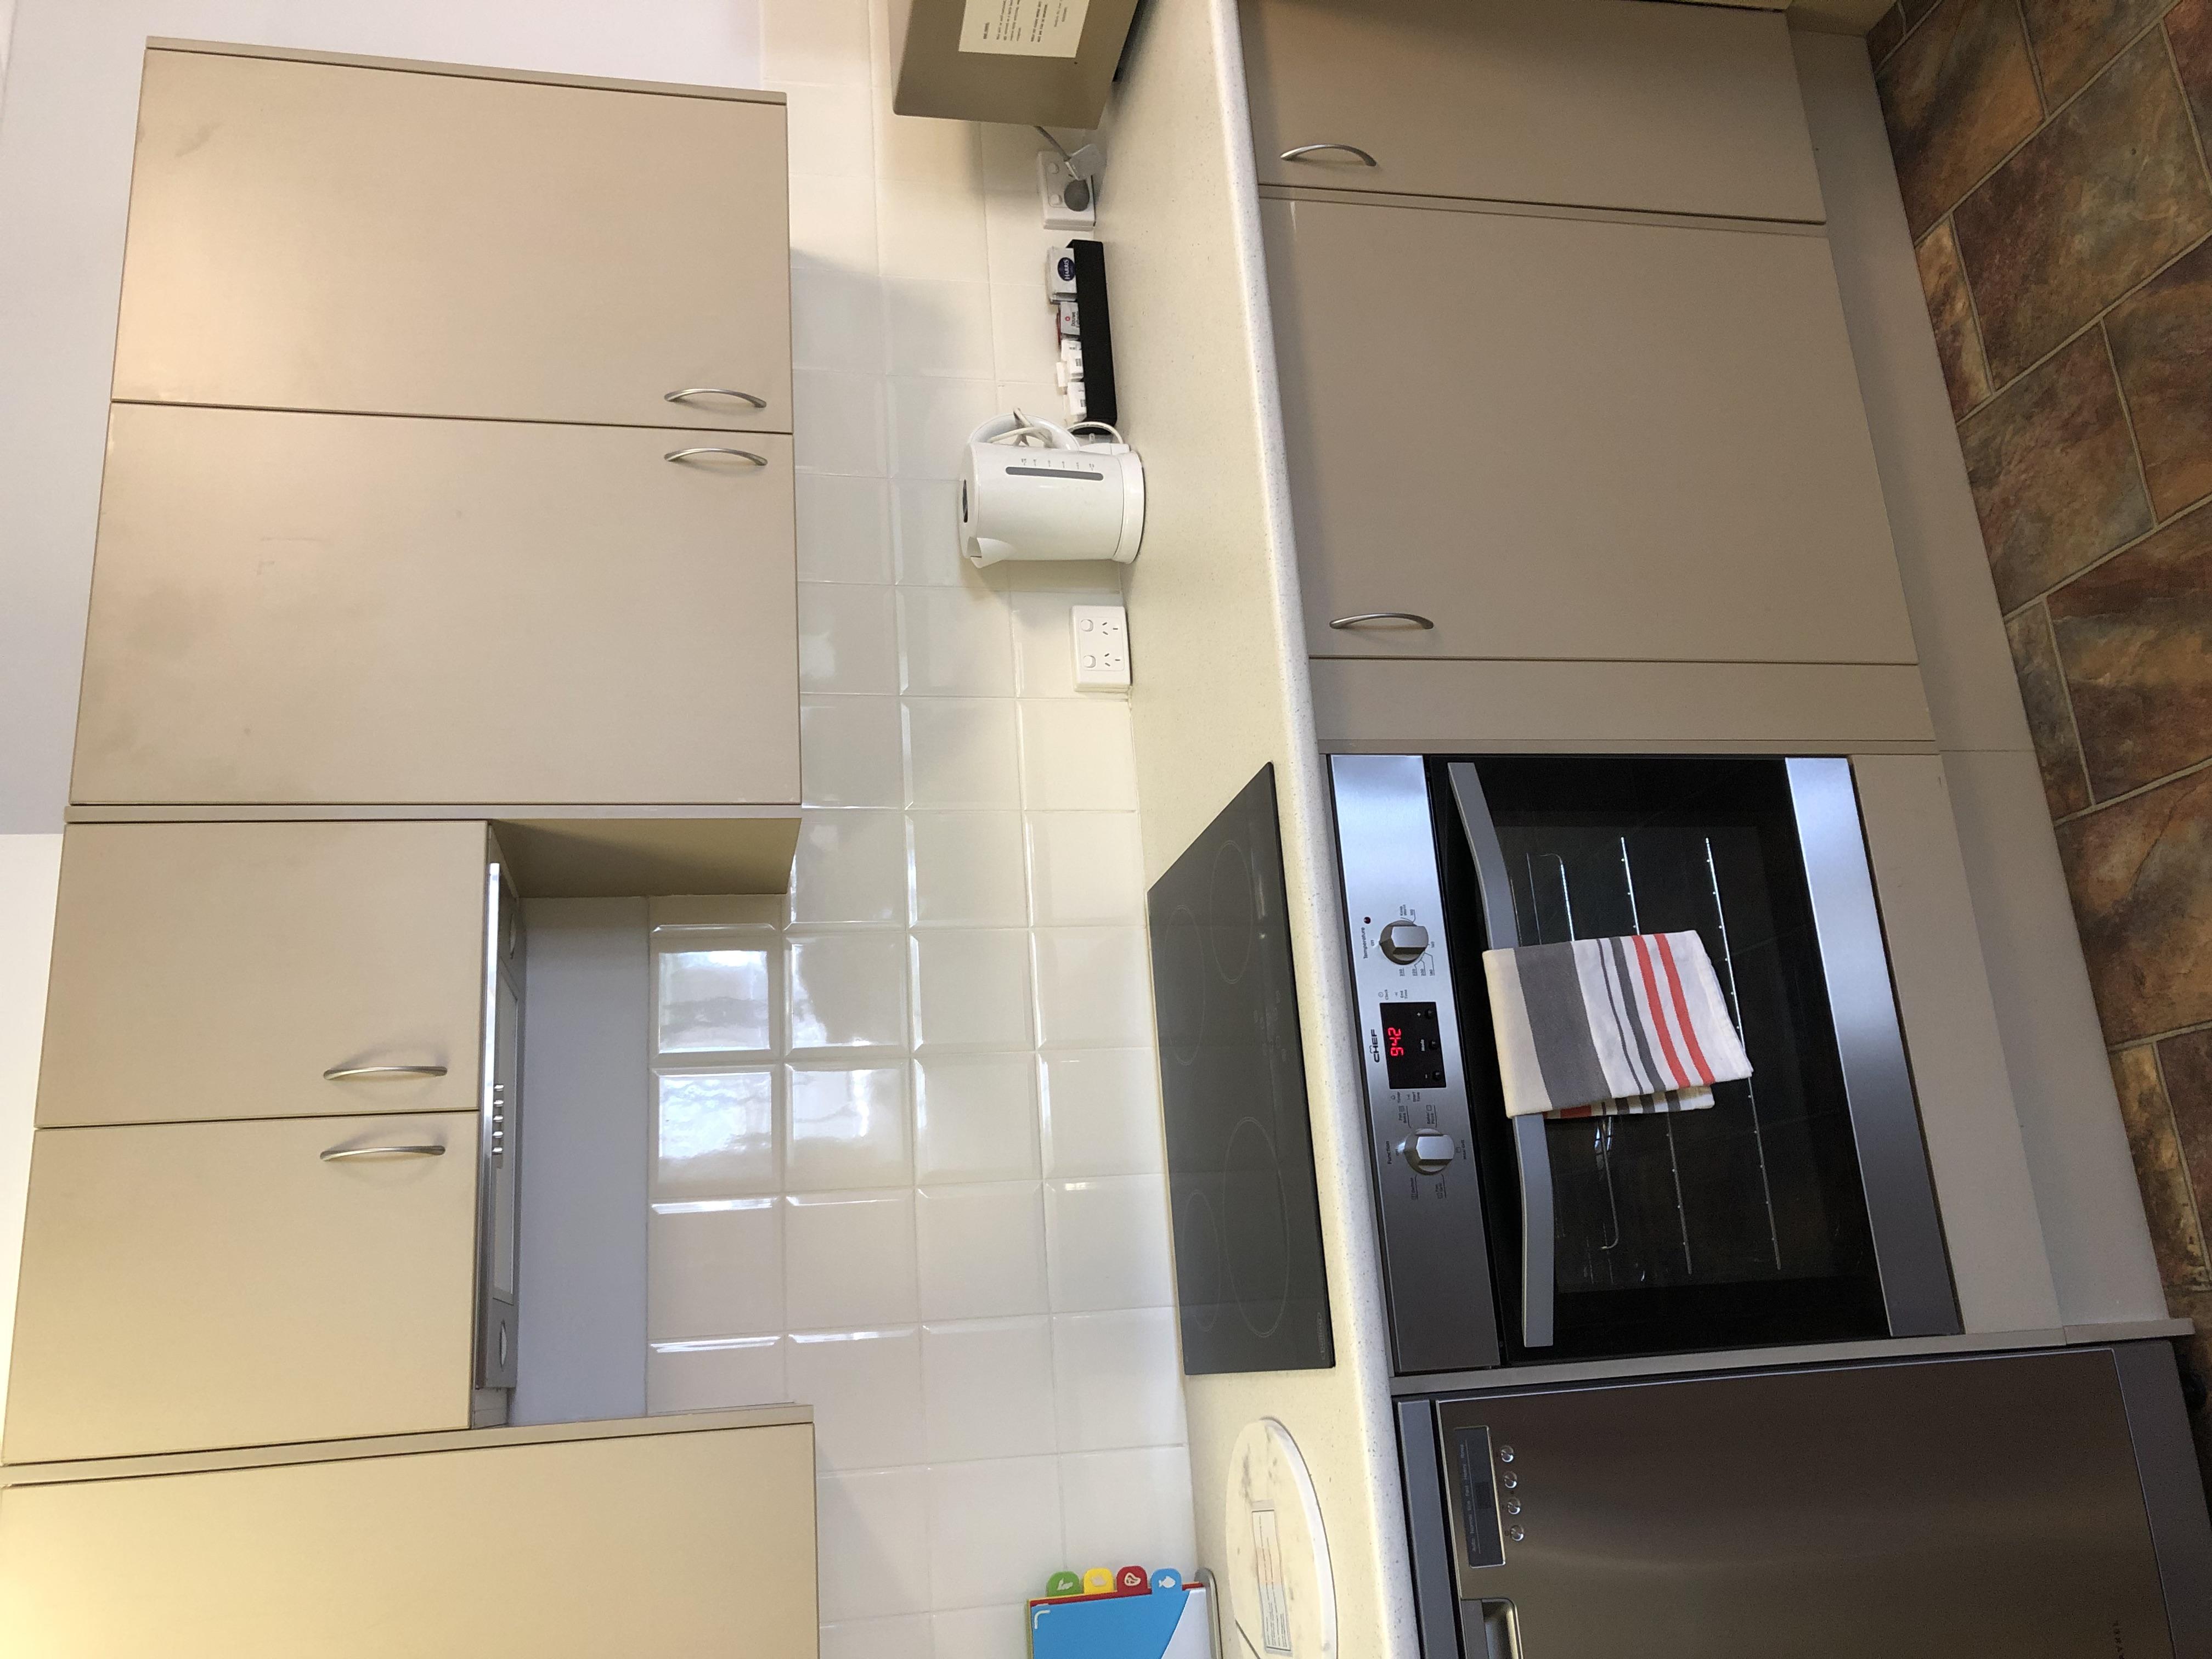 Kitchen with stove, rangehood, oven